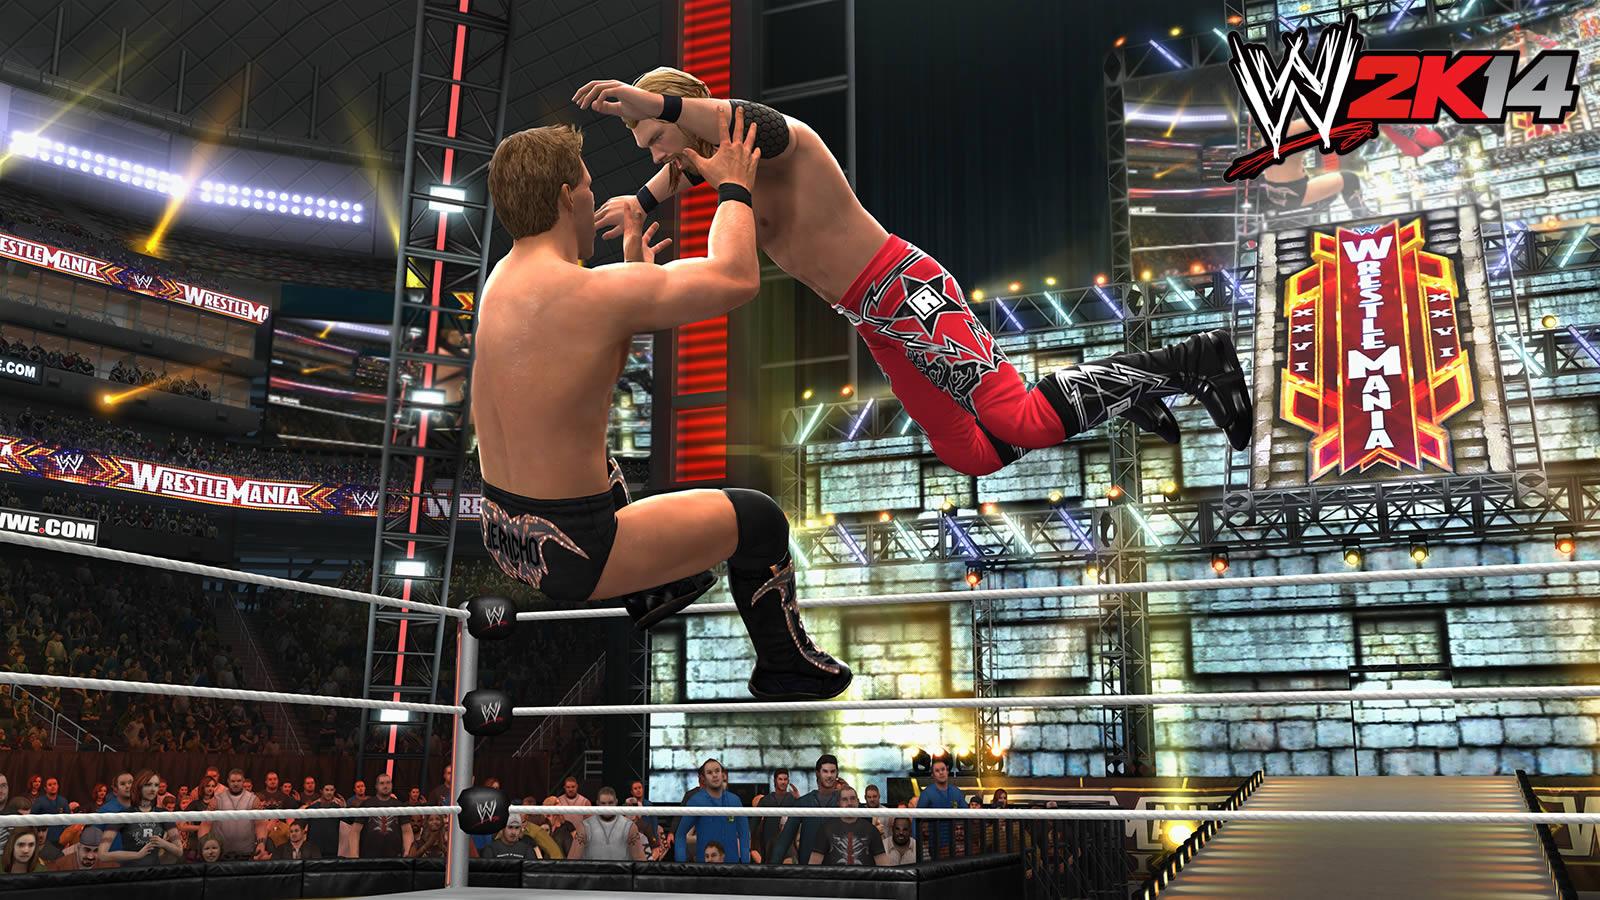 Undertaker Vs John Cena Wrestlemania 30 [IMAGES] WWE 2K14: 30 ...